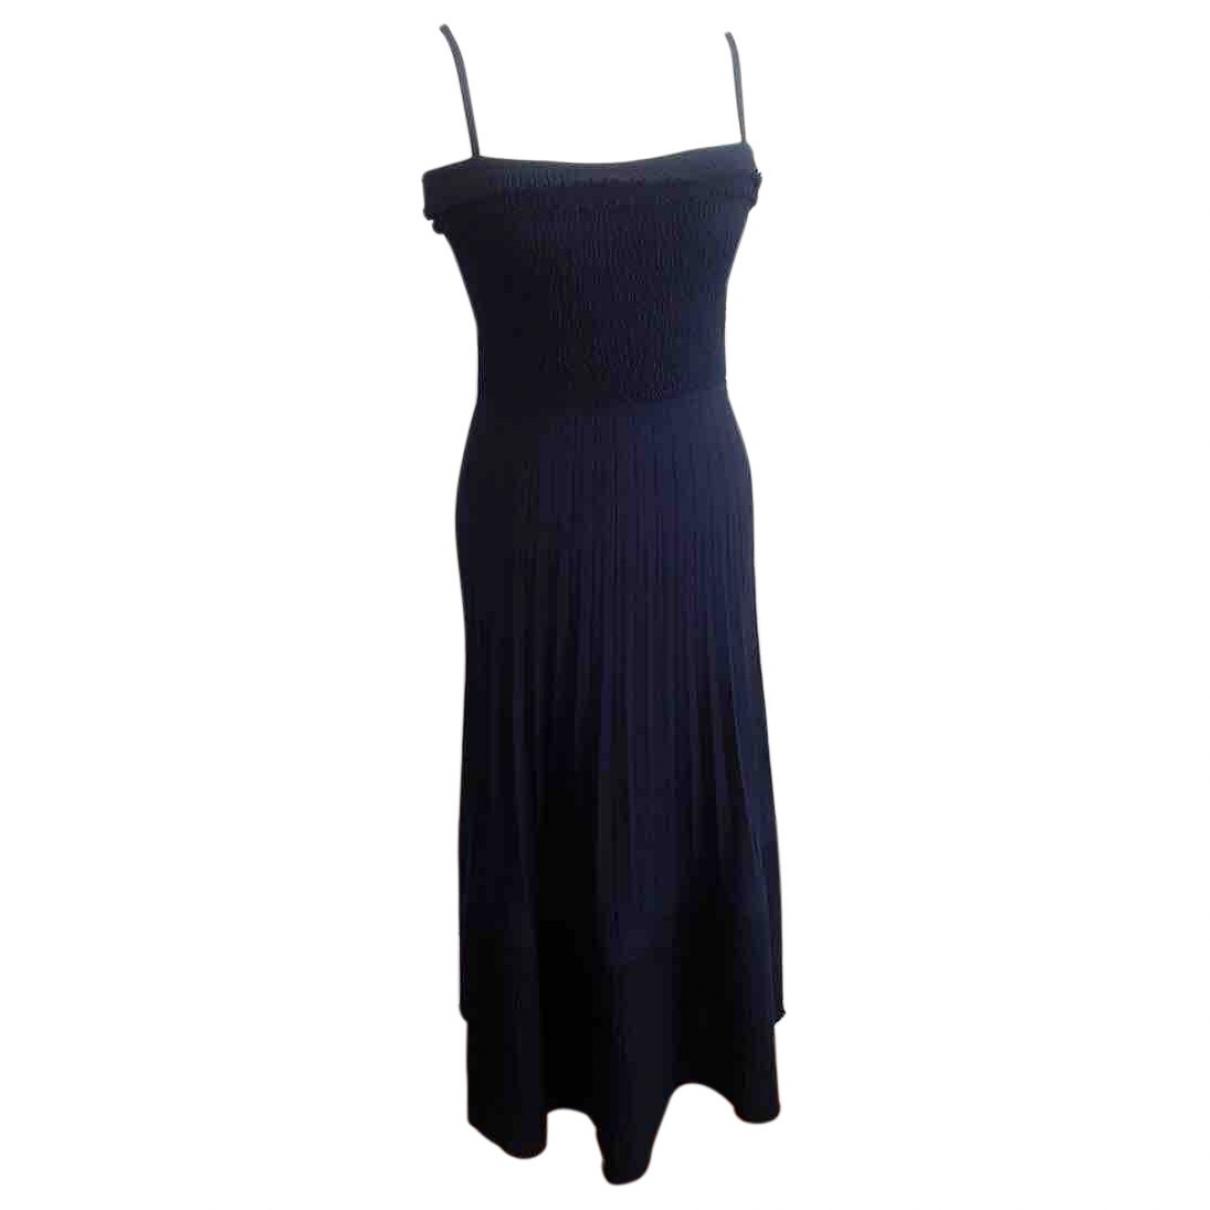 Salvatore Ferragamo \N Kleid in Baumwolle